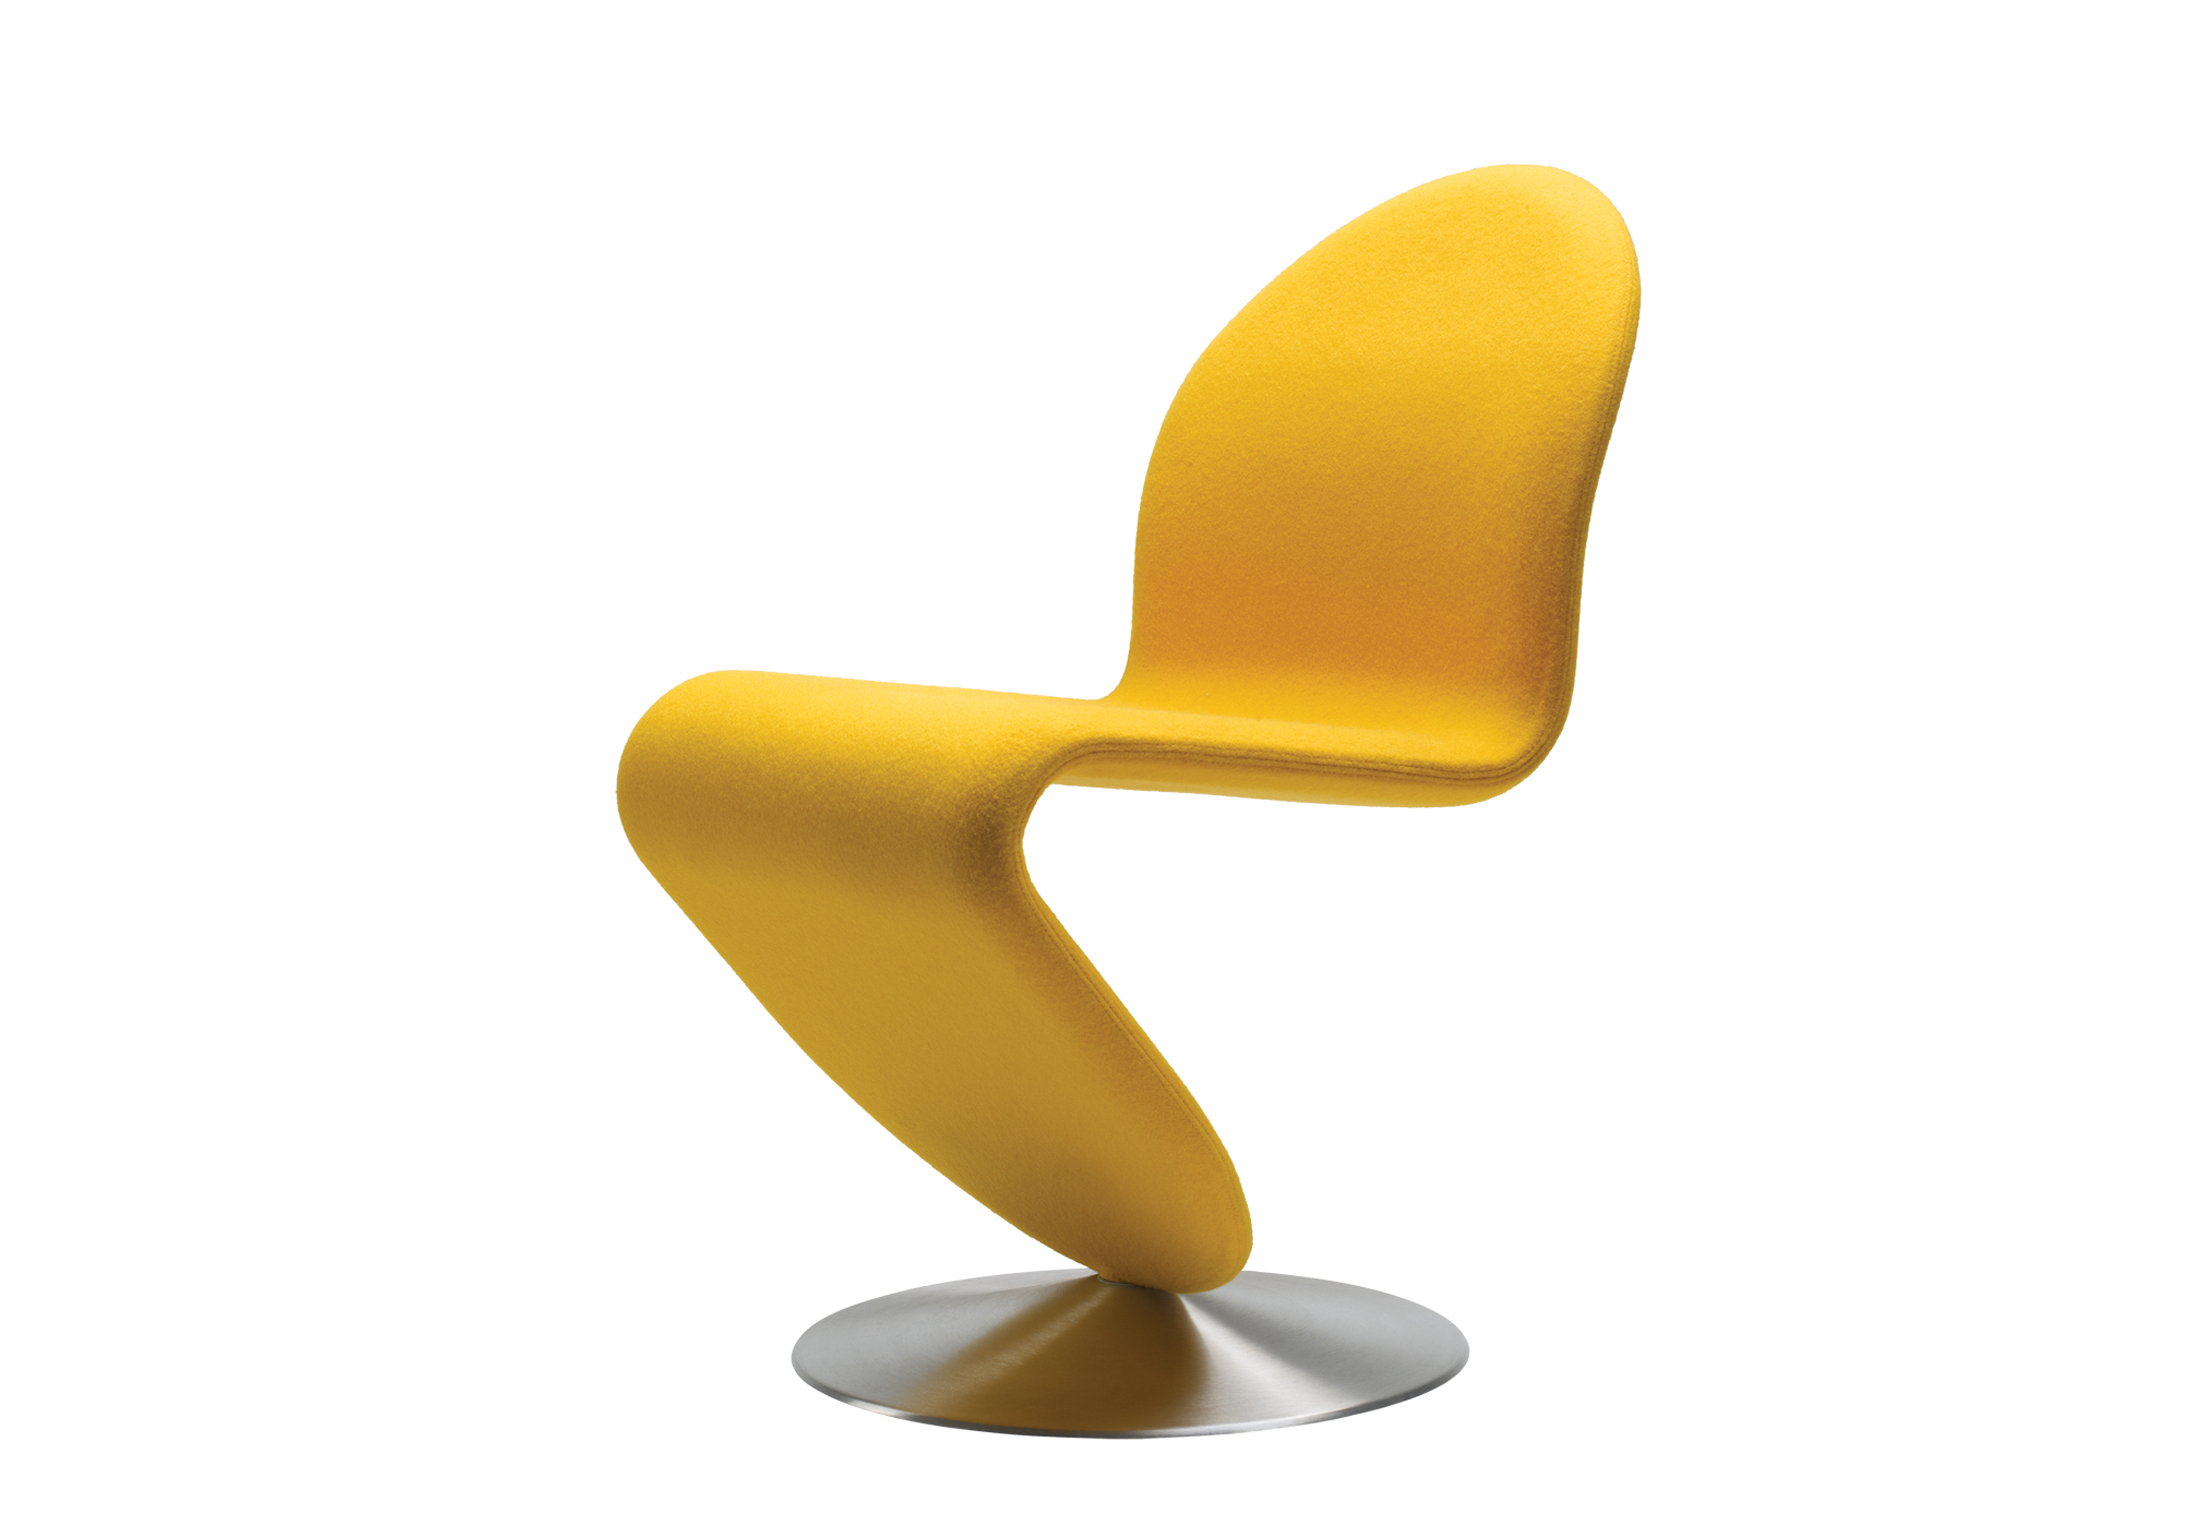 Dining chair standard 1 2 3 von verpan stylepark for Carrelage 1 3 2 3